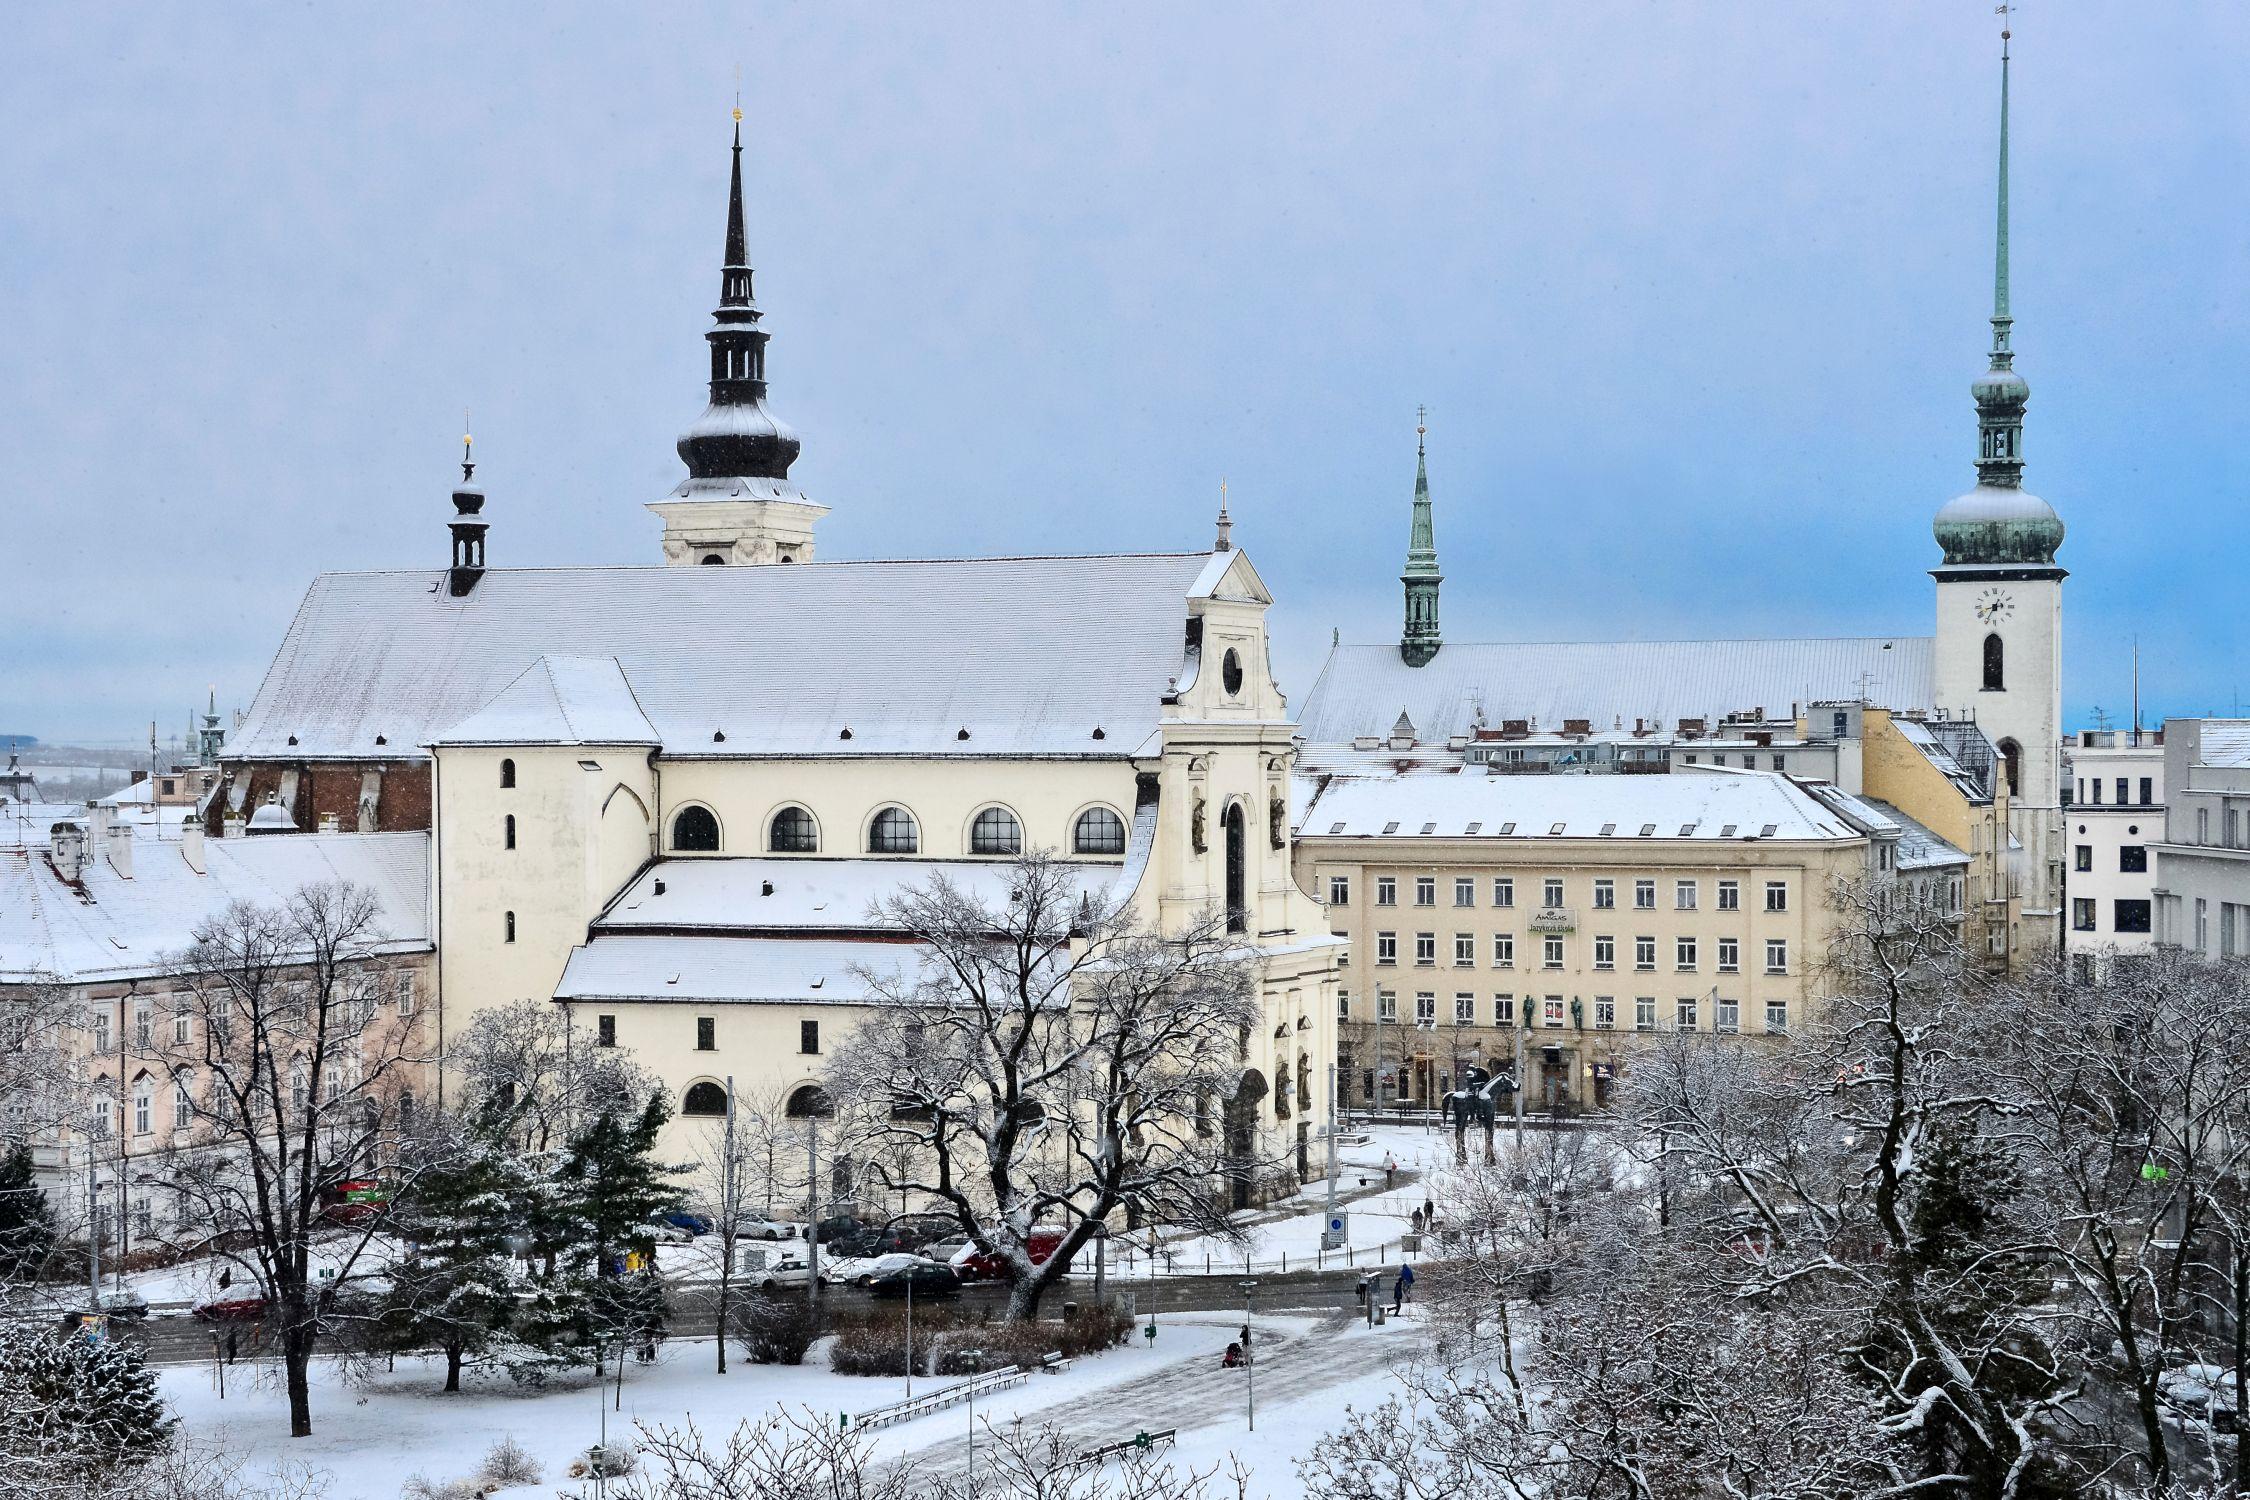 Moravian Square in Brno during winter